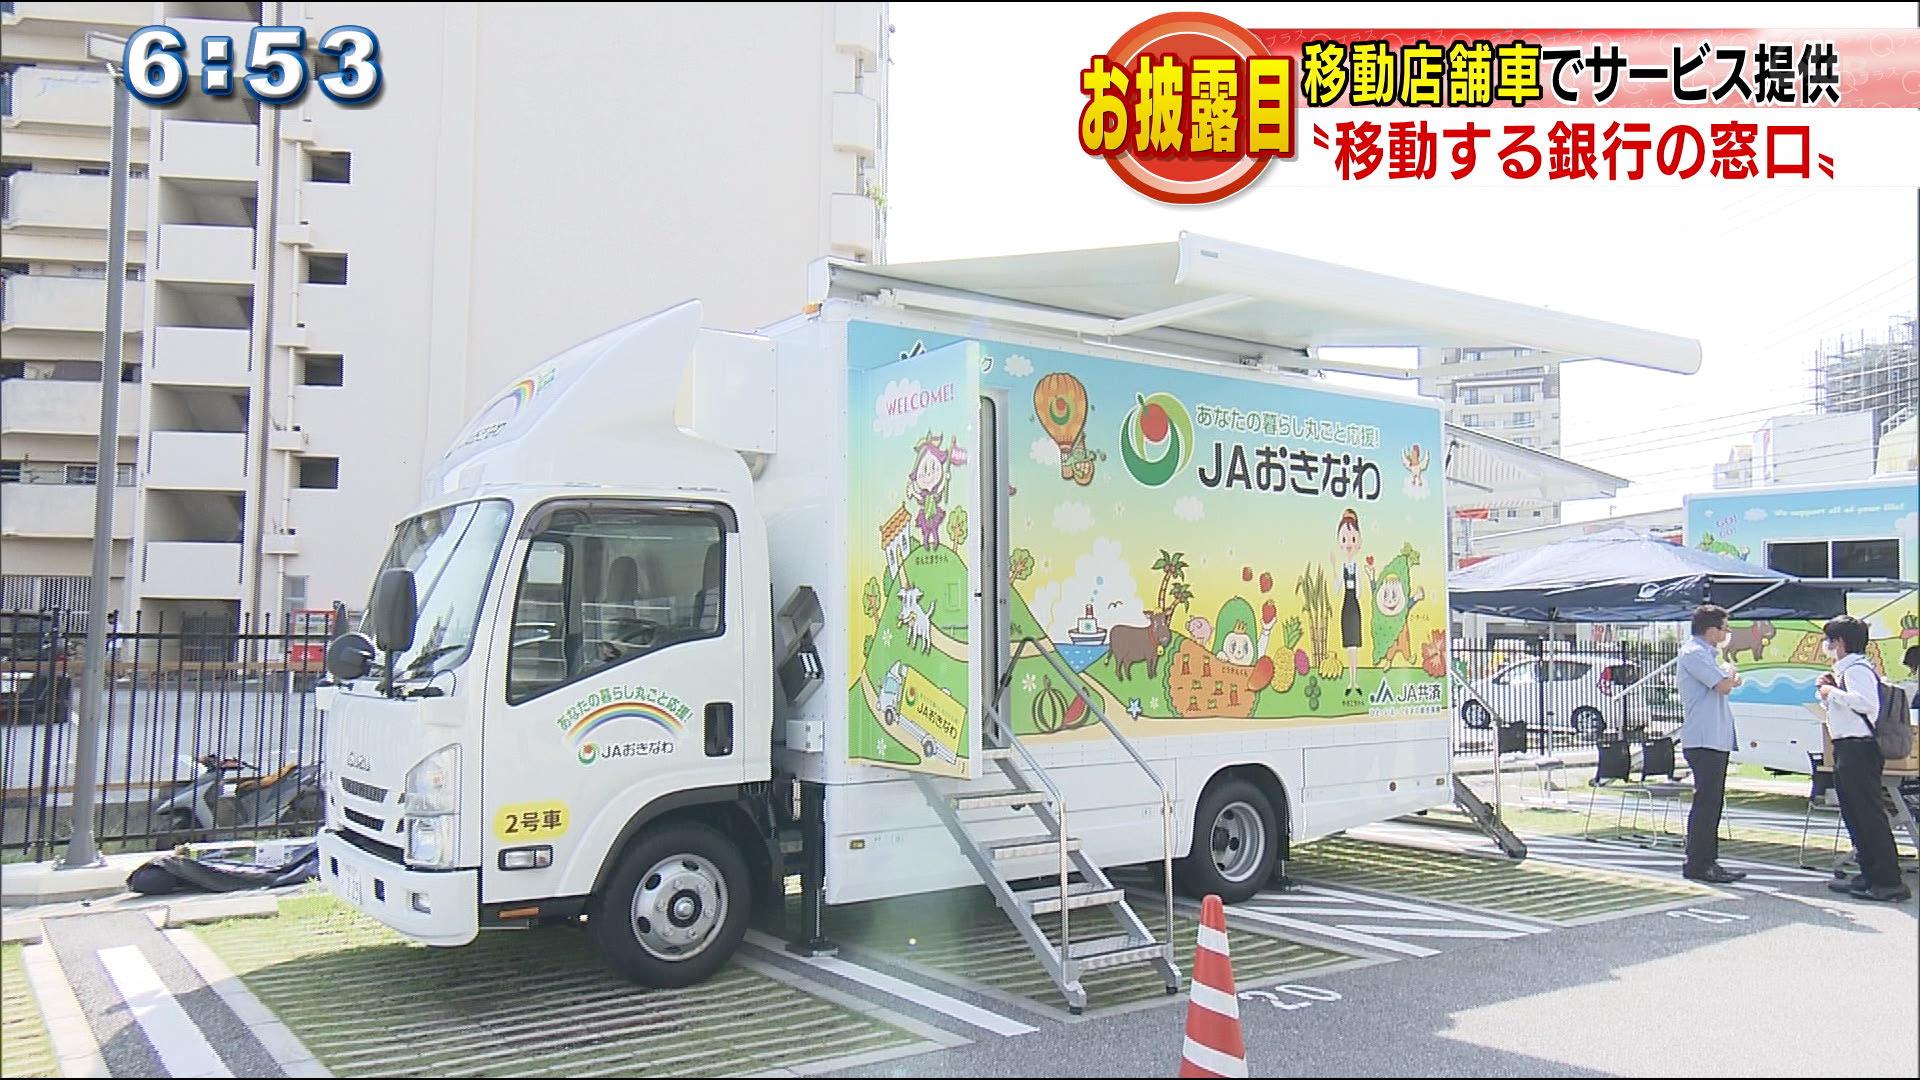 JAバンク「移動店舗車」お披露目